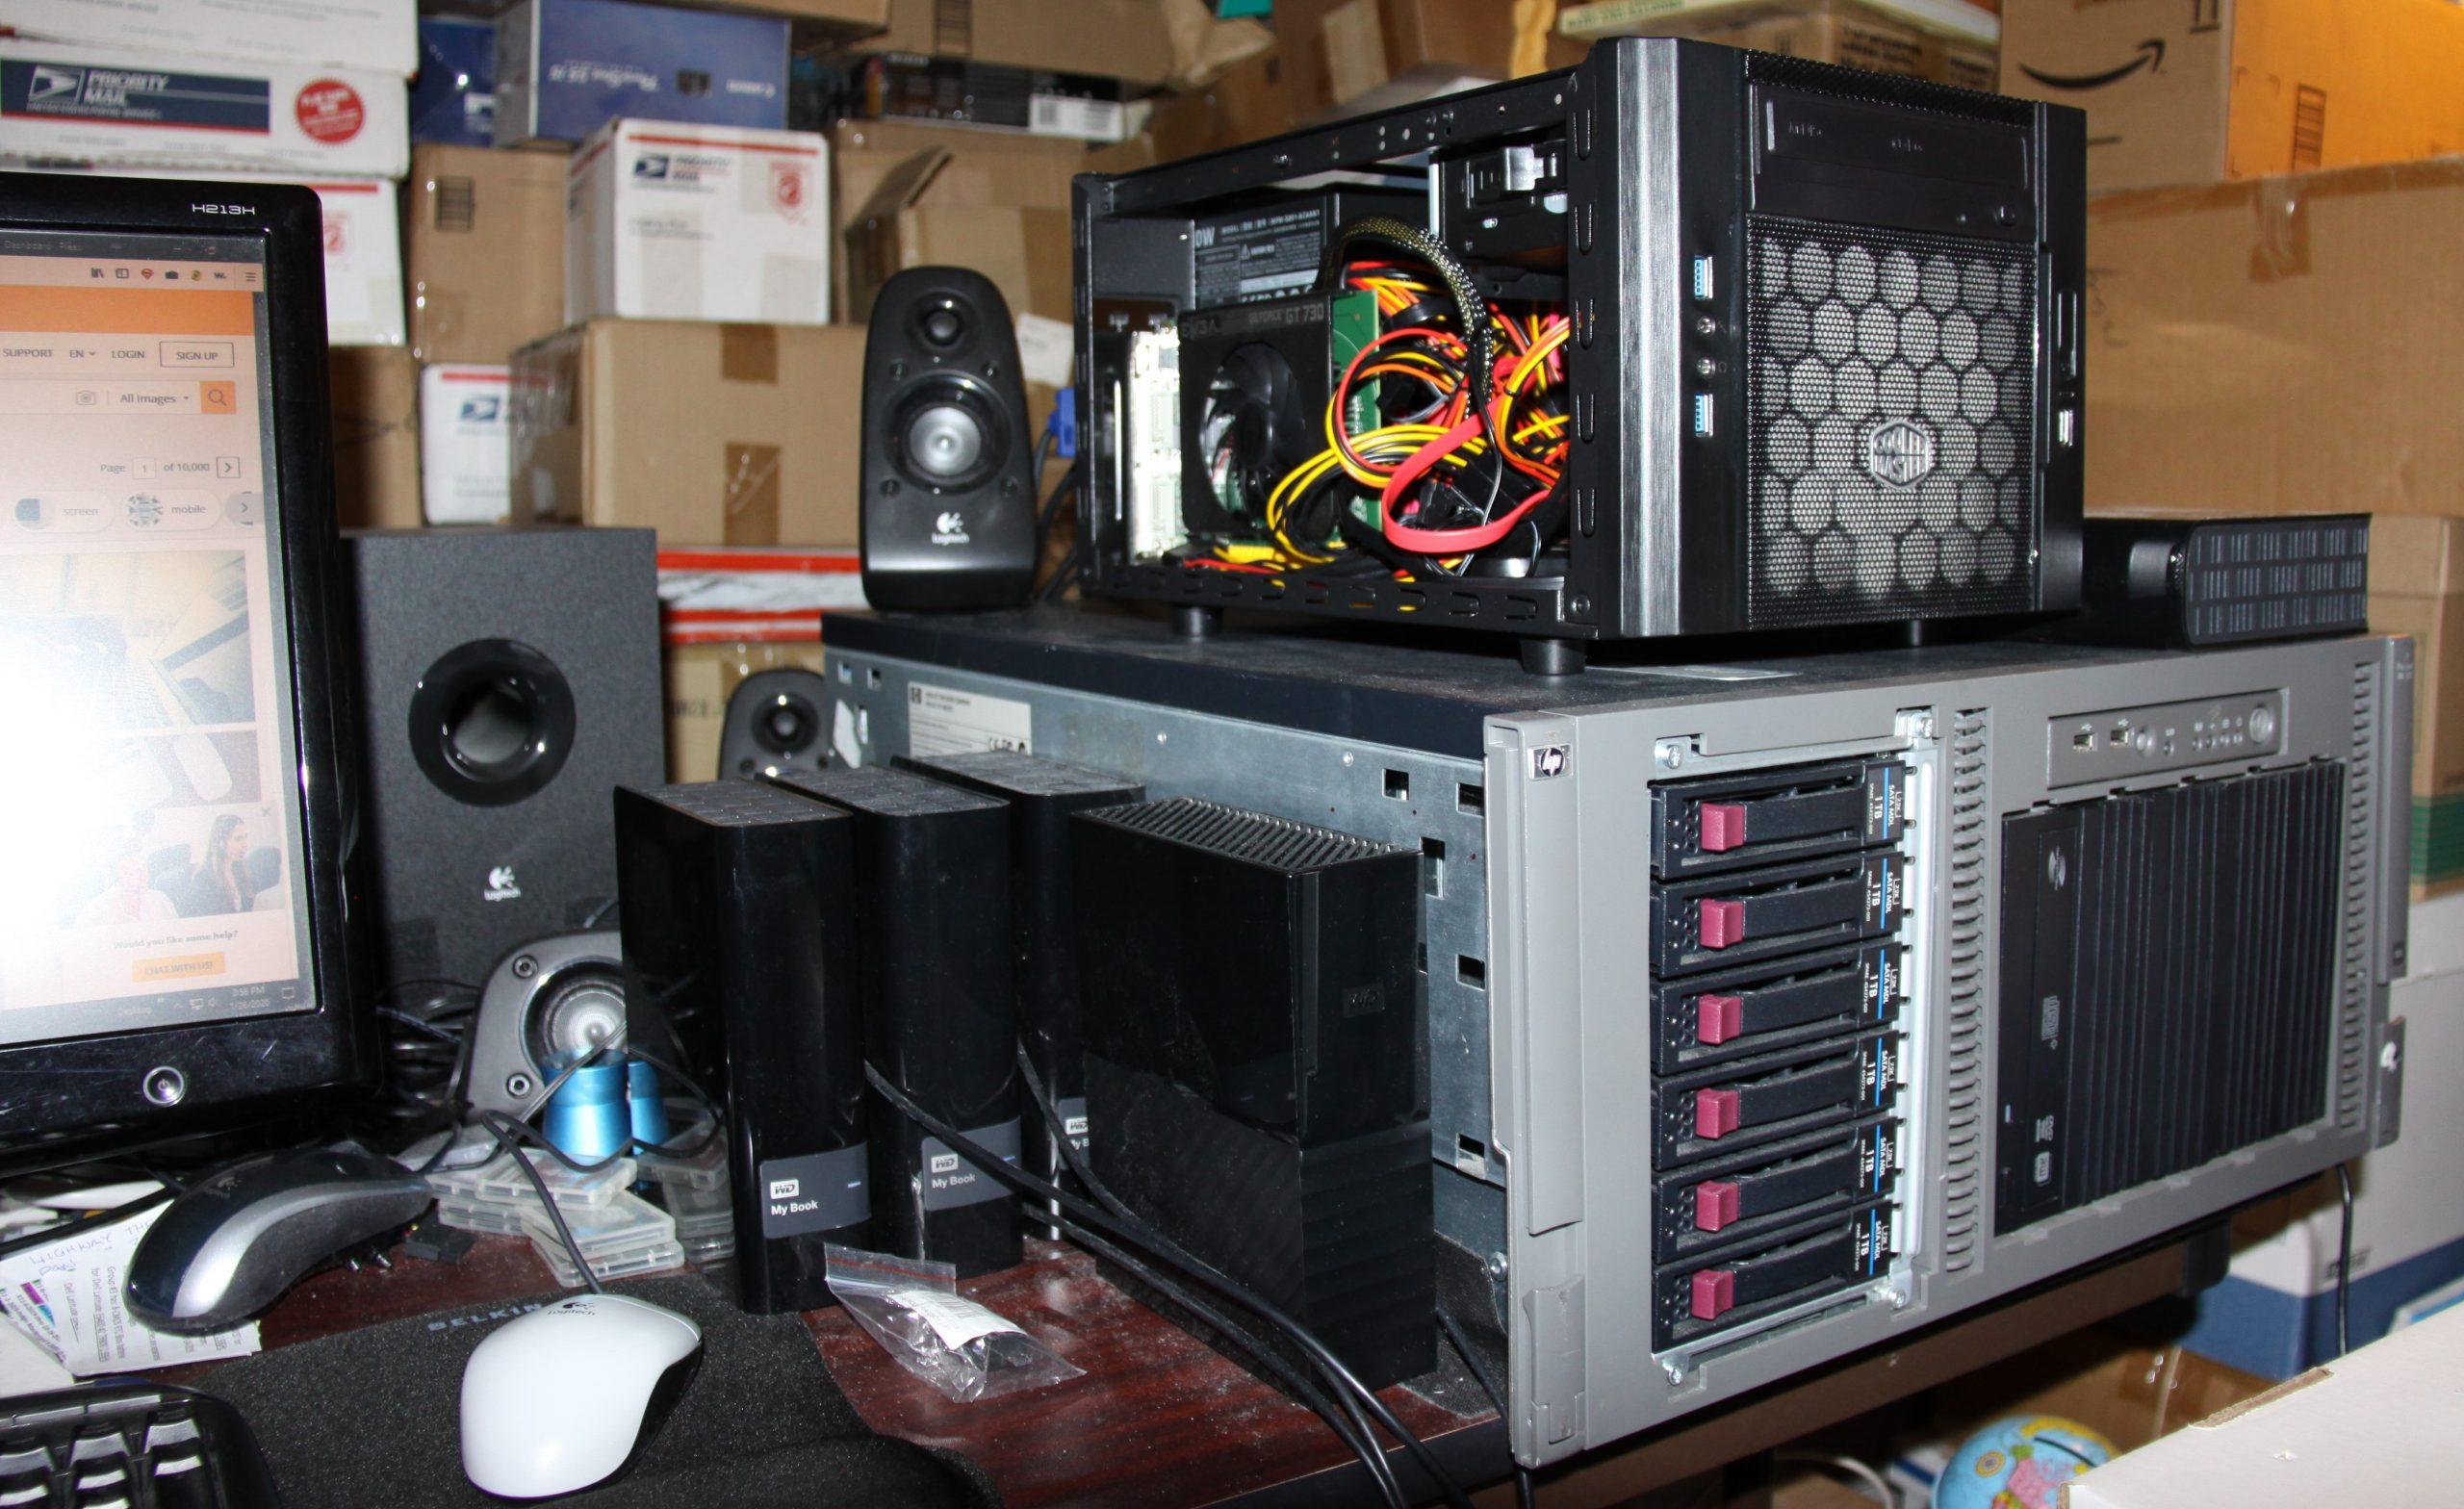 HP Proliant ML350 G5 Rack Workstation